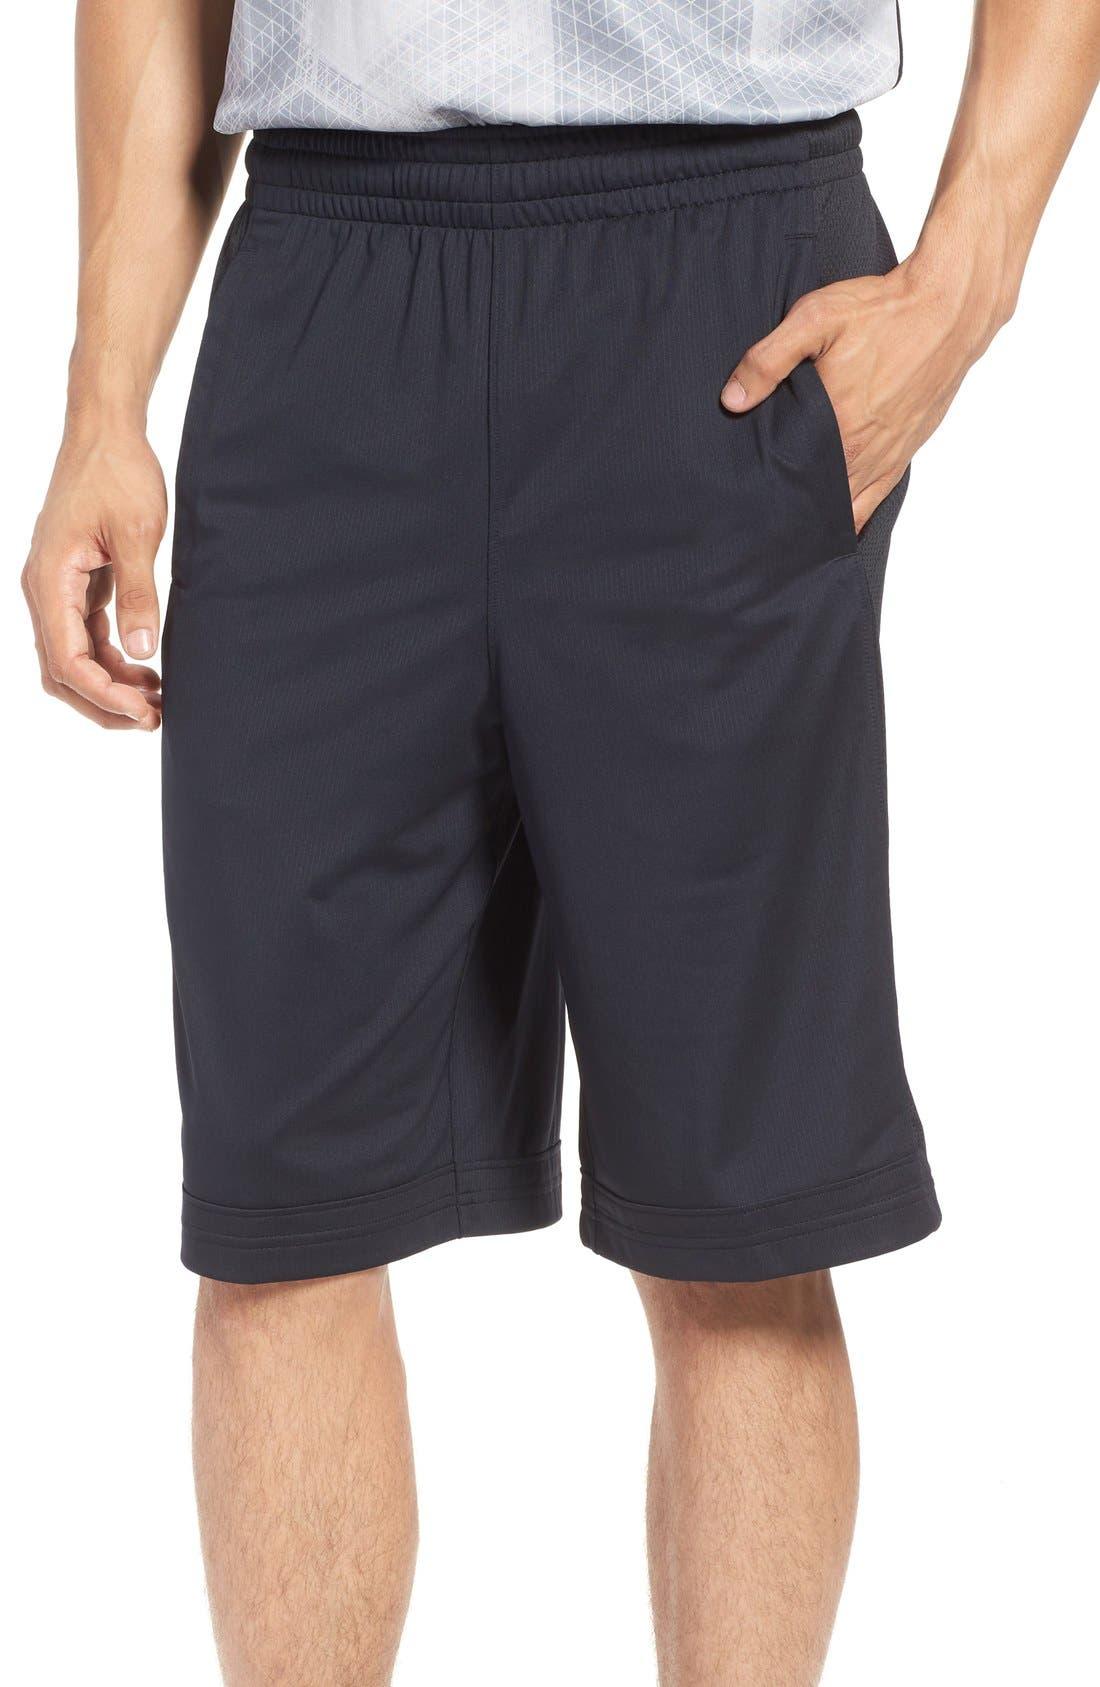 'Isolation' Athletic Shorts,                         Main,                         color, Black